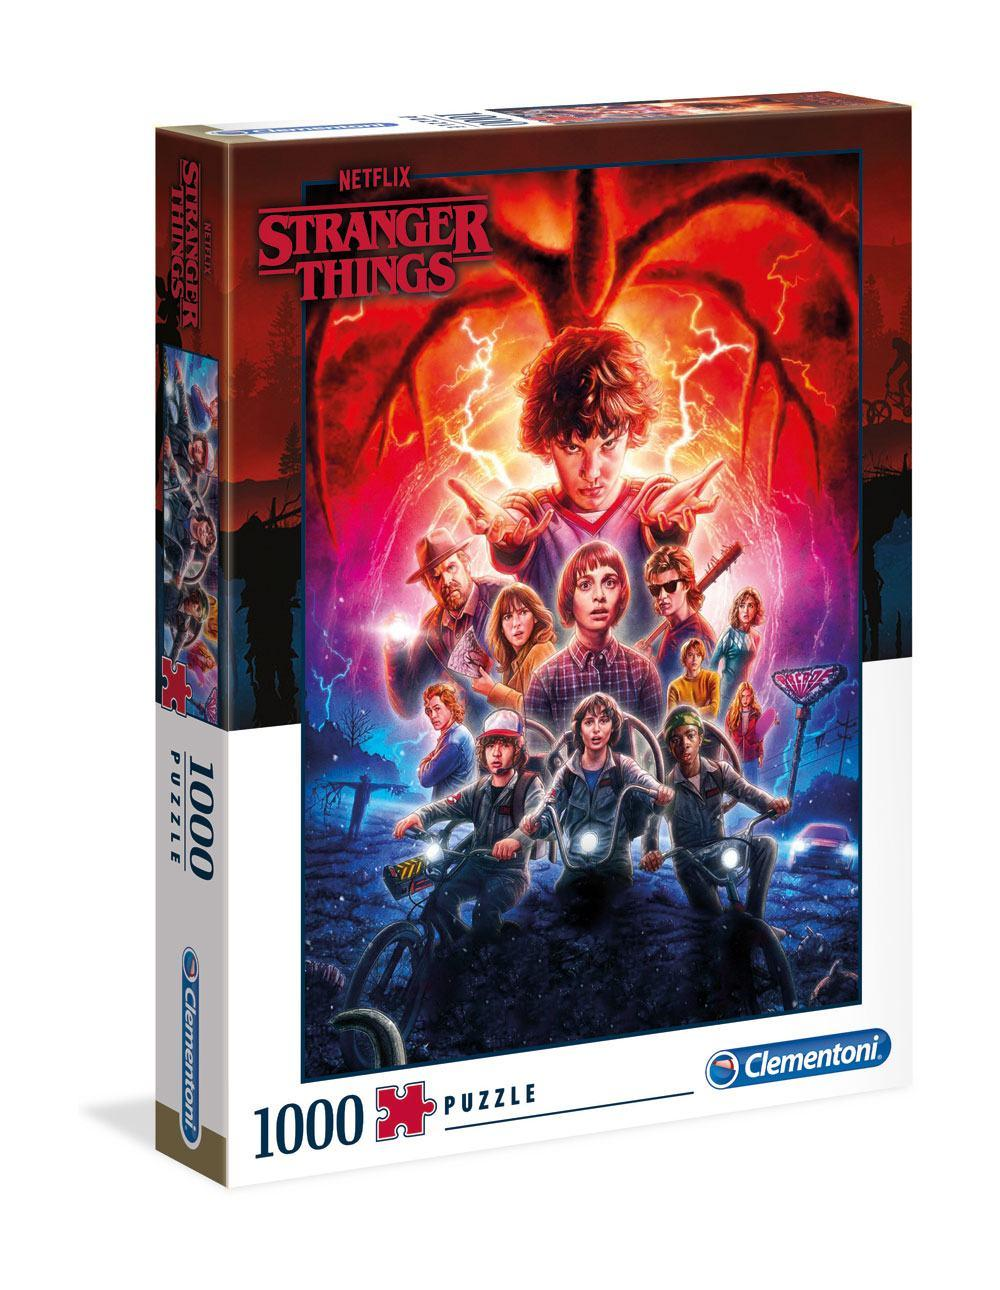 STRANGER THINGS - Season 2 - Puzzle 1000P_1